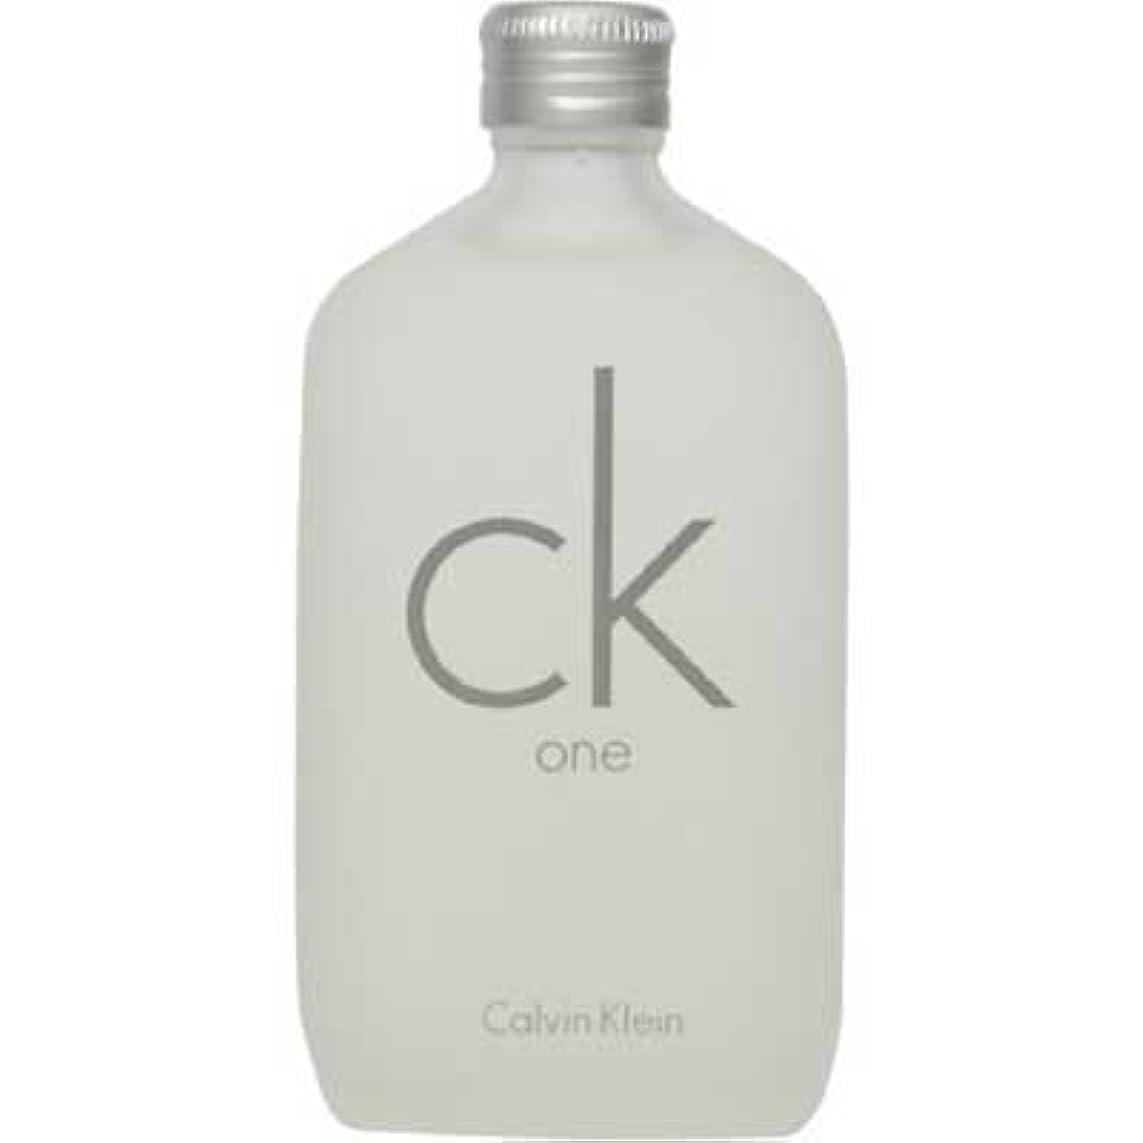 富明日推進力ck Calvin Klein シーケーワン 100ml EDT [107407/125014] [並行輸入品]